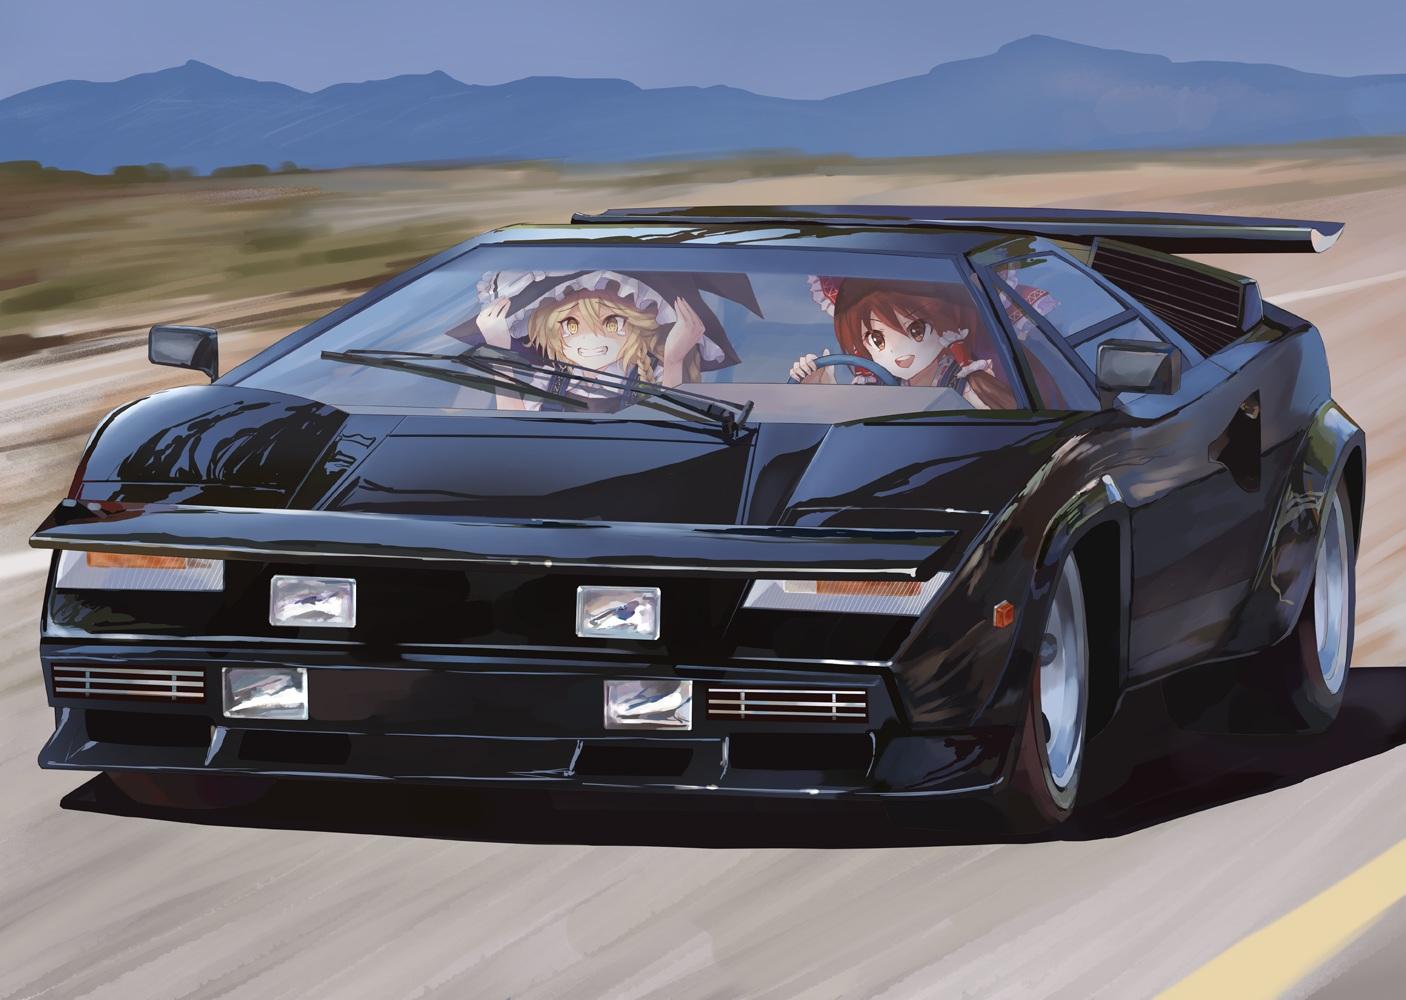 2girls car hakurei_reimu kirisame_marisa parody takepon1123 the_cannonball_run touhou